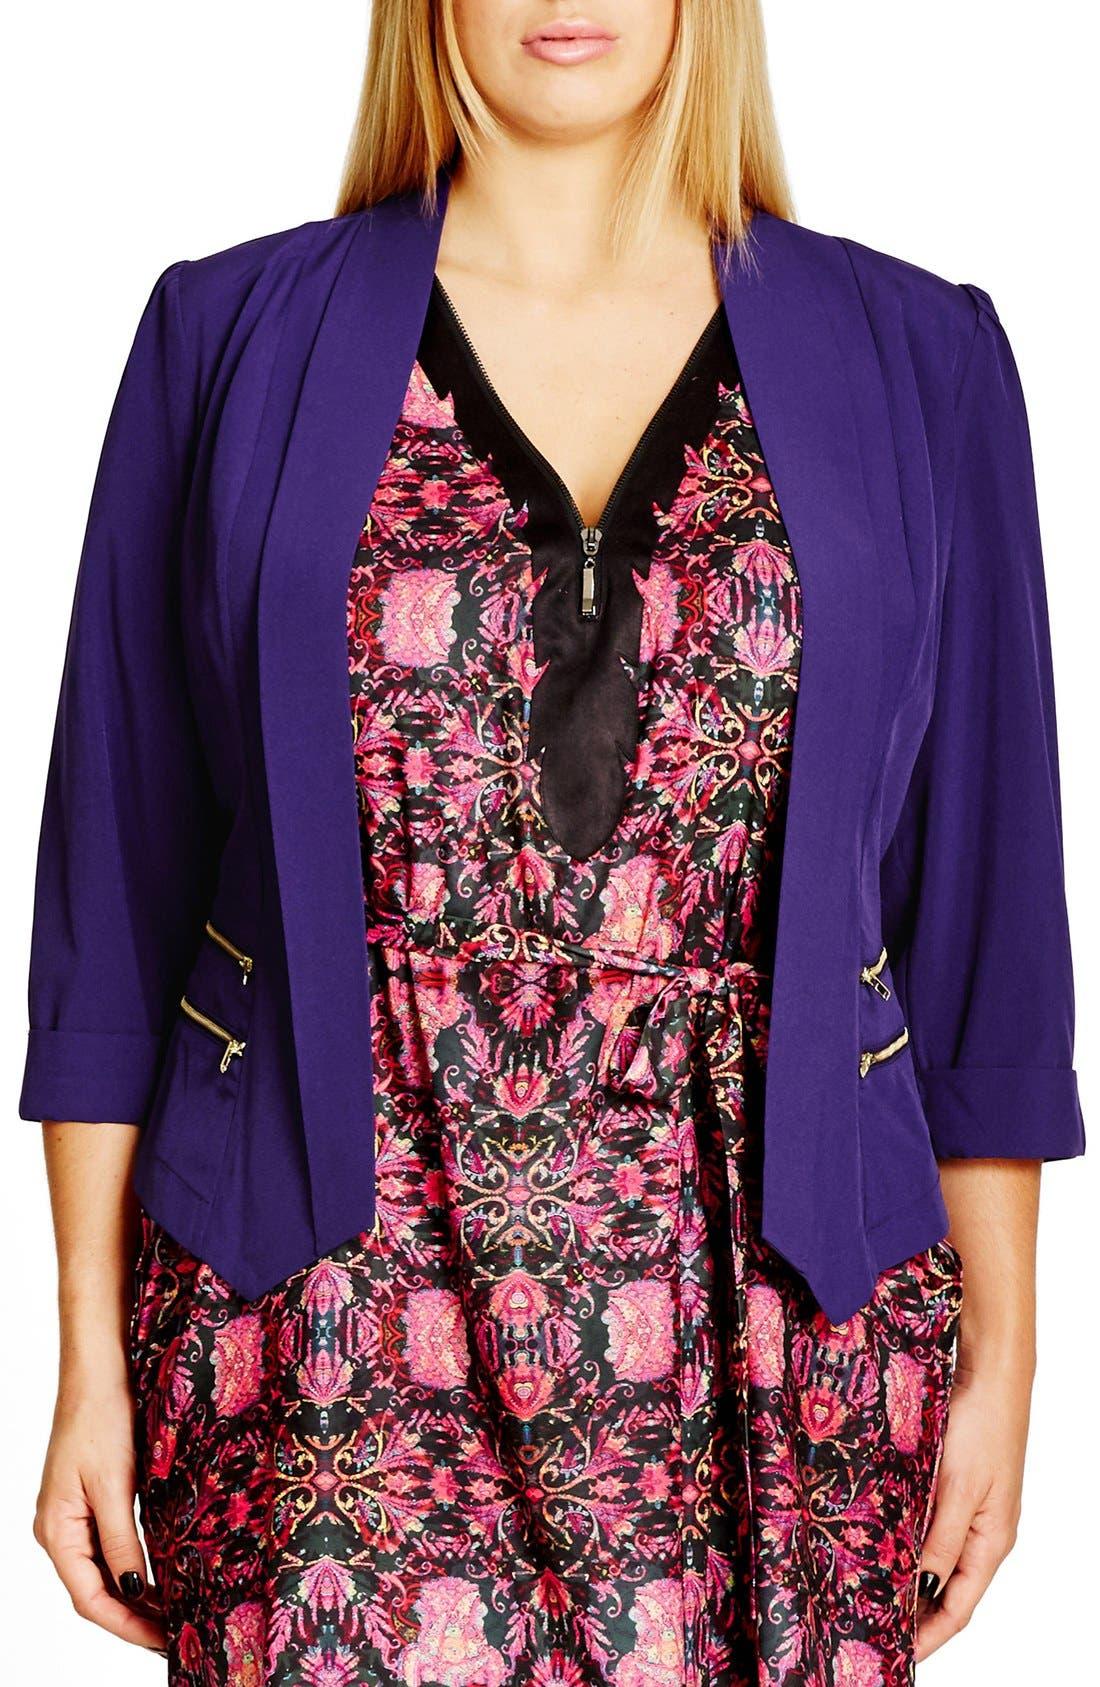 Alternate Image 1 Selected - City Chic Double Zip Jacket (Plus Size)